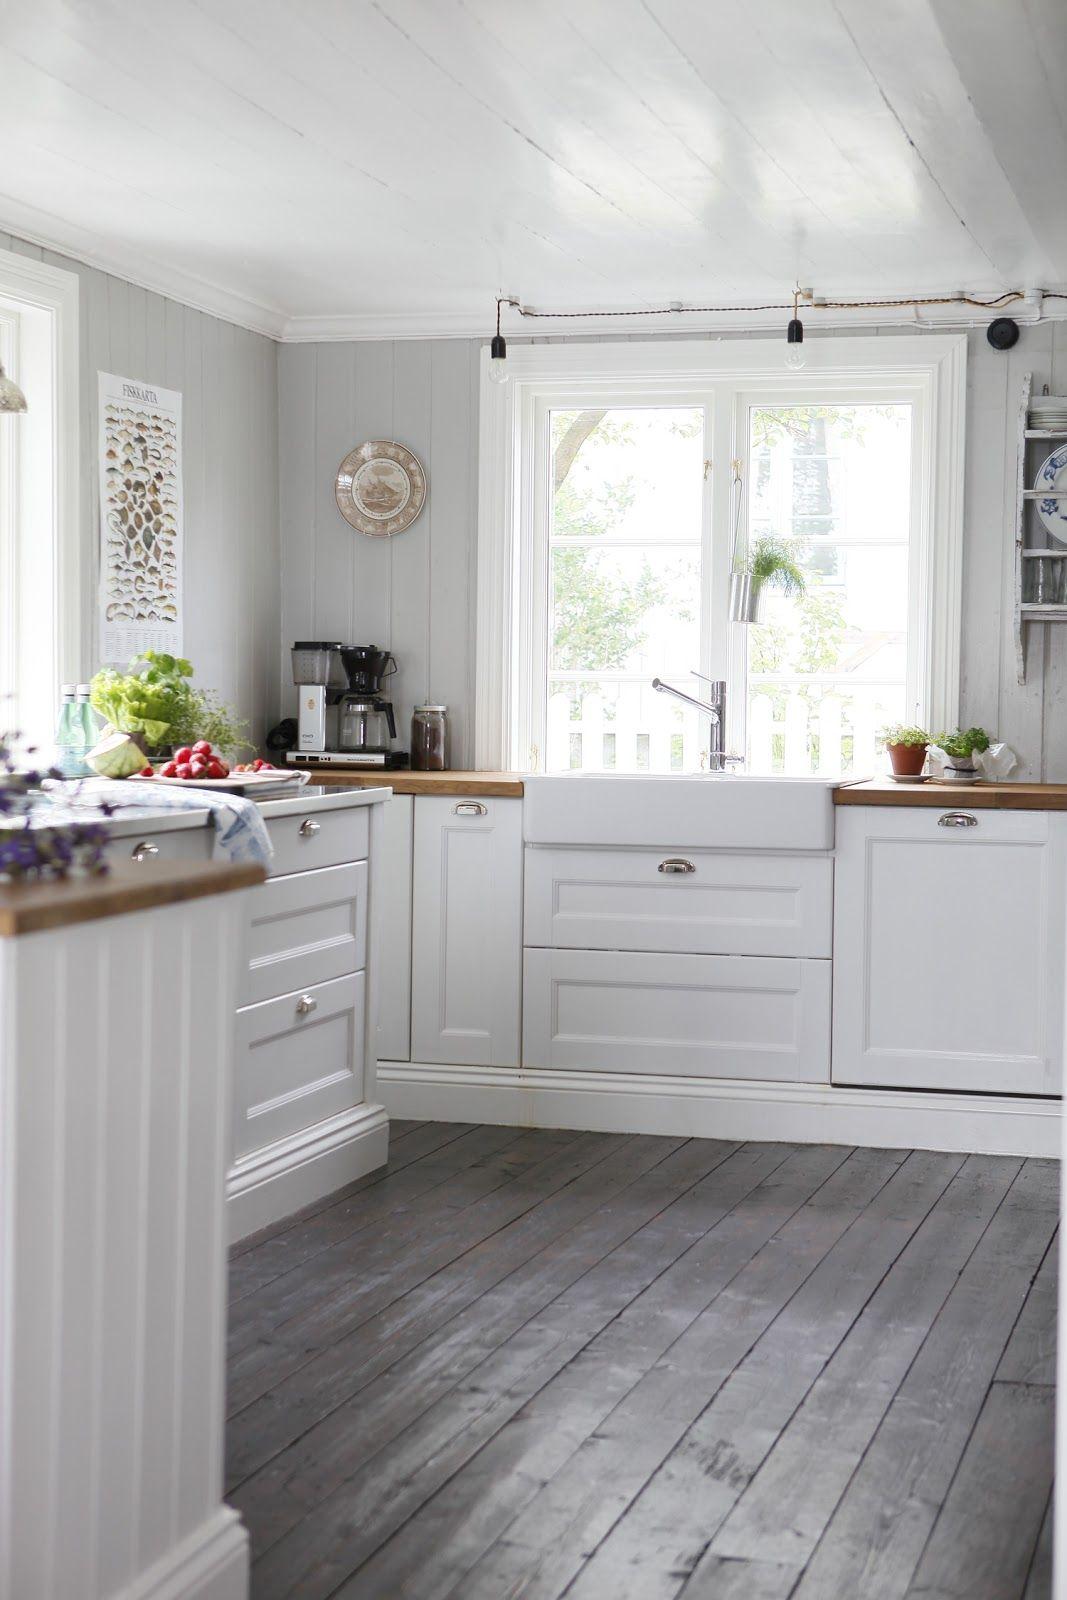 kitchen floor cabinets Planks